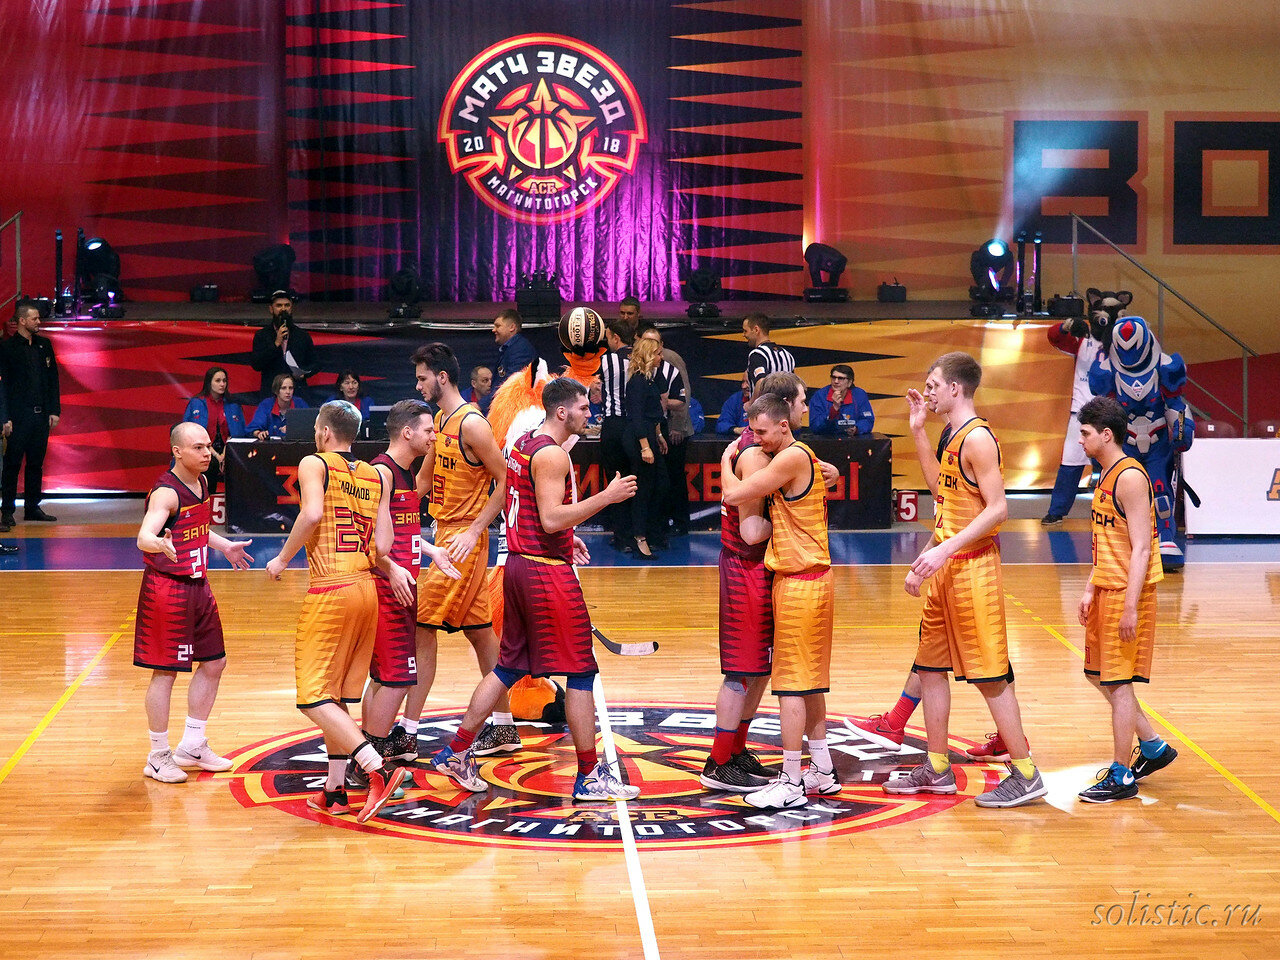 50 Матч звезд АСБ 2018 (ассоциации студенческого баскетбола)